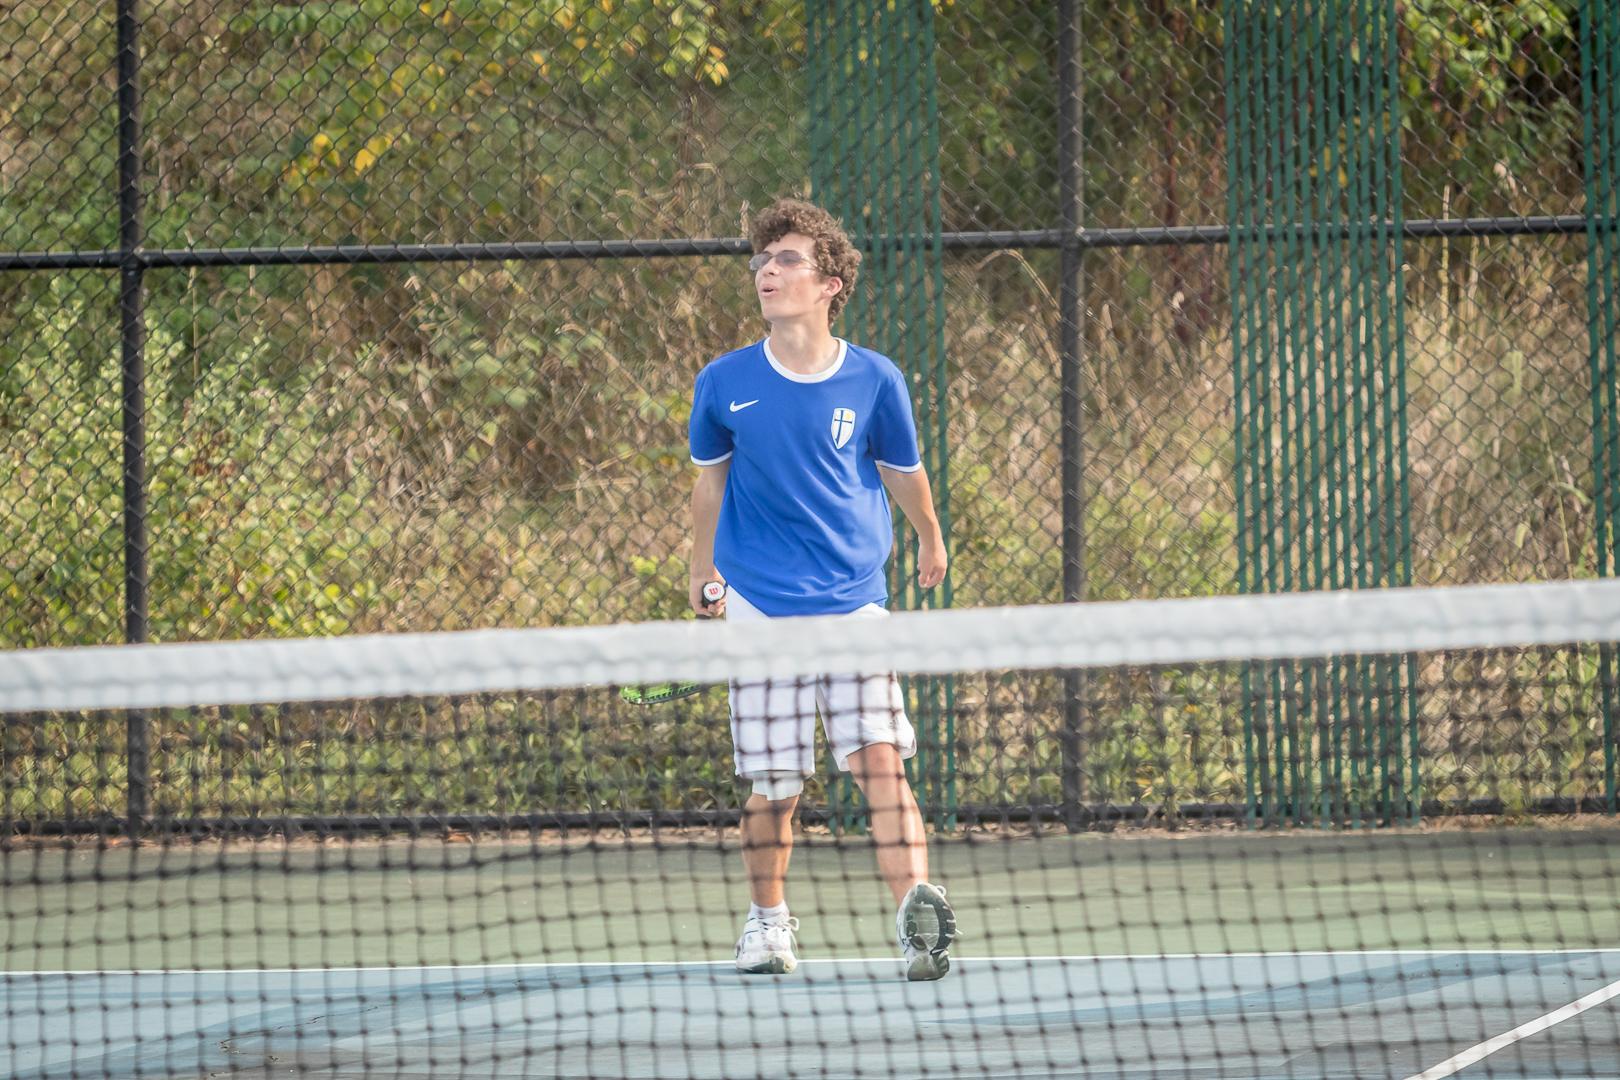 Marian-Boys-Tennis-1720.jpg